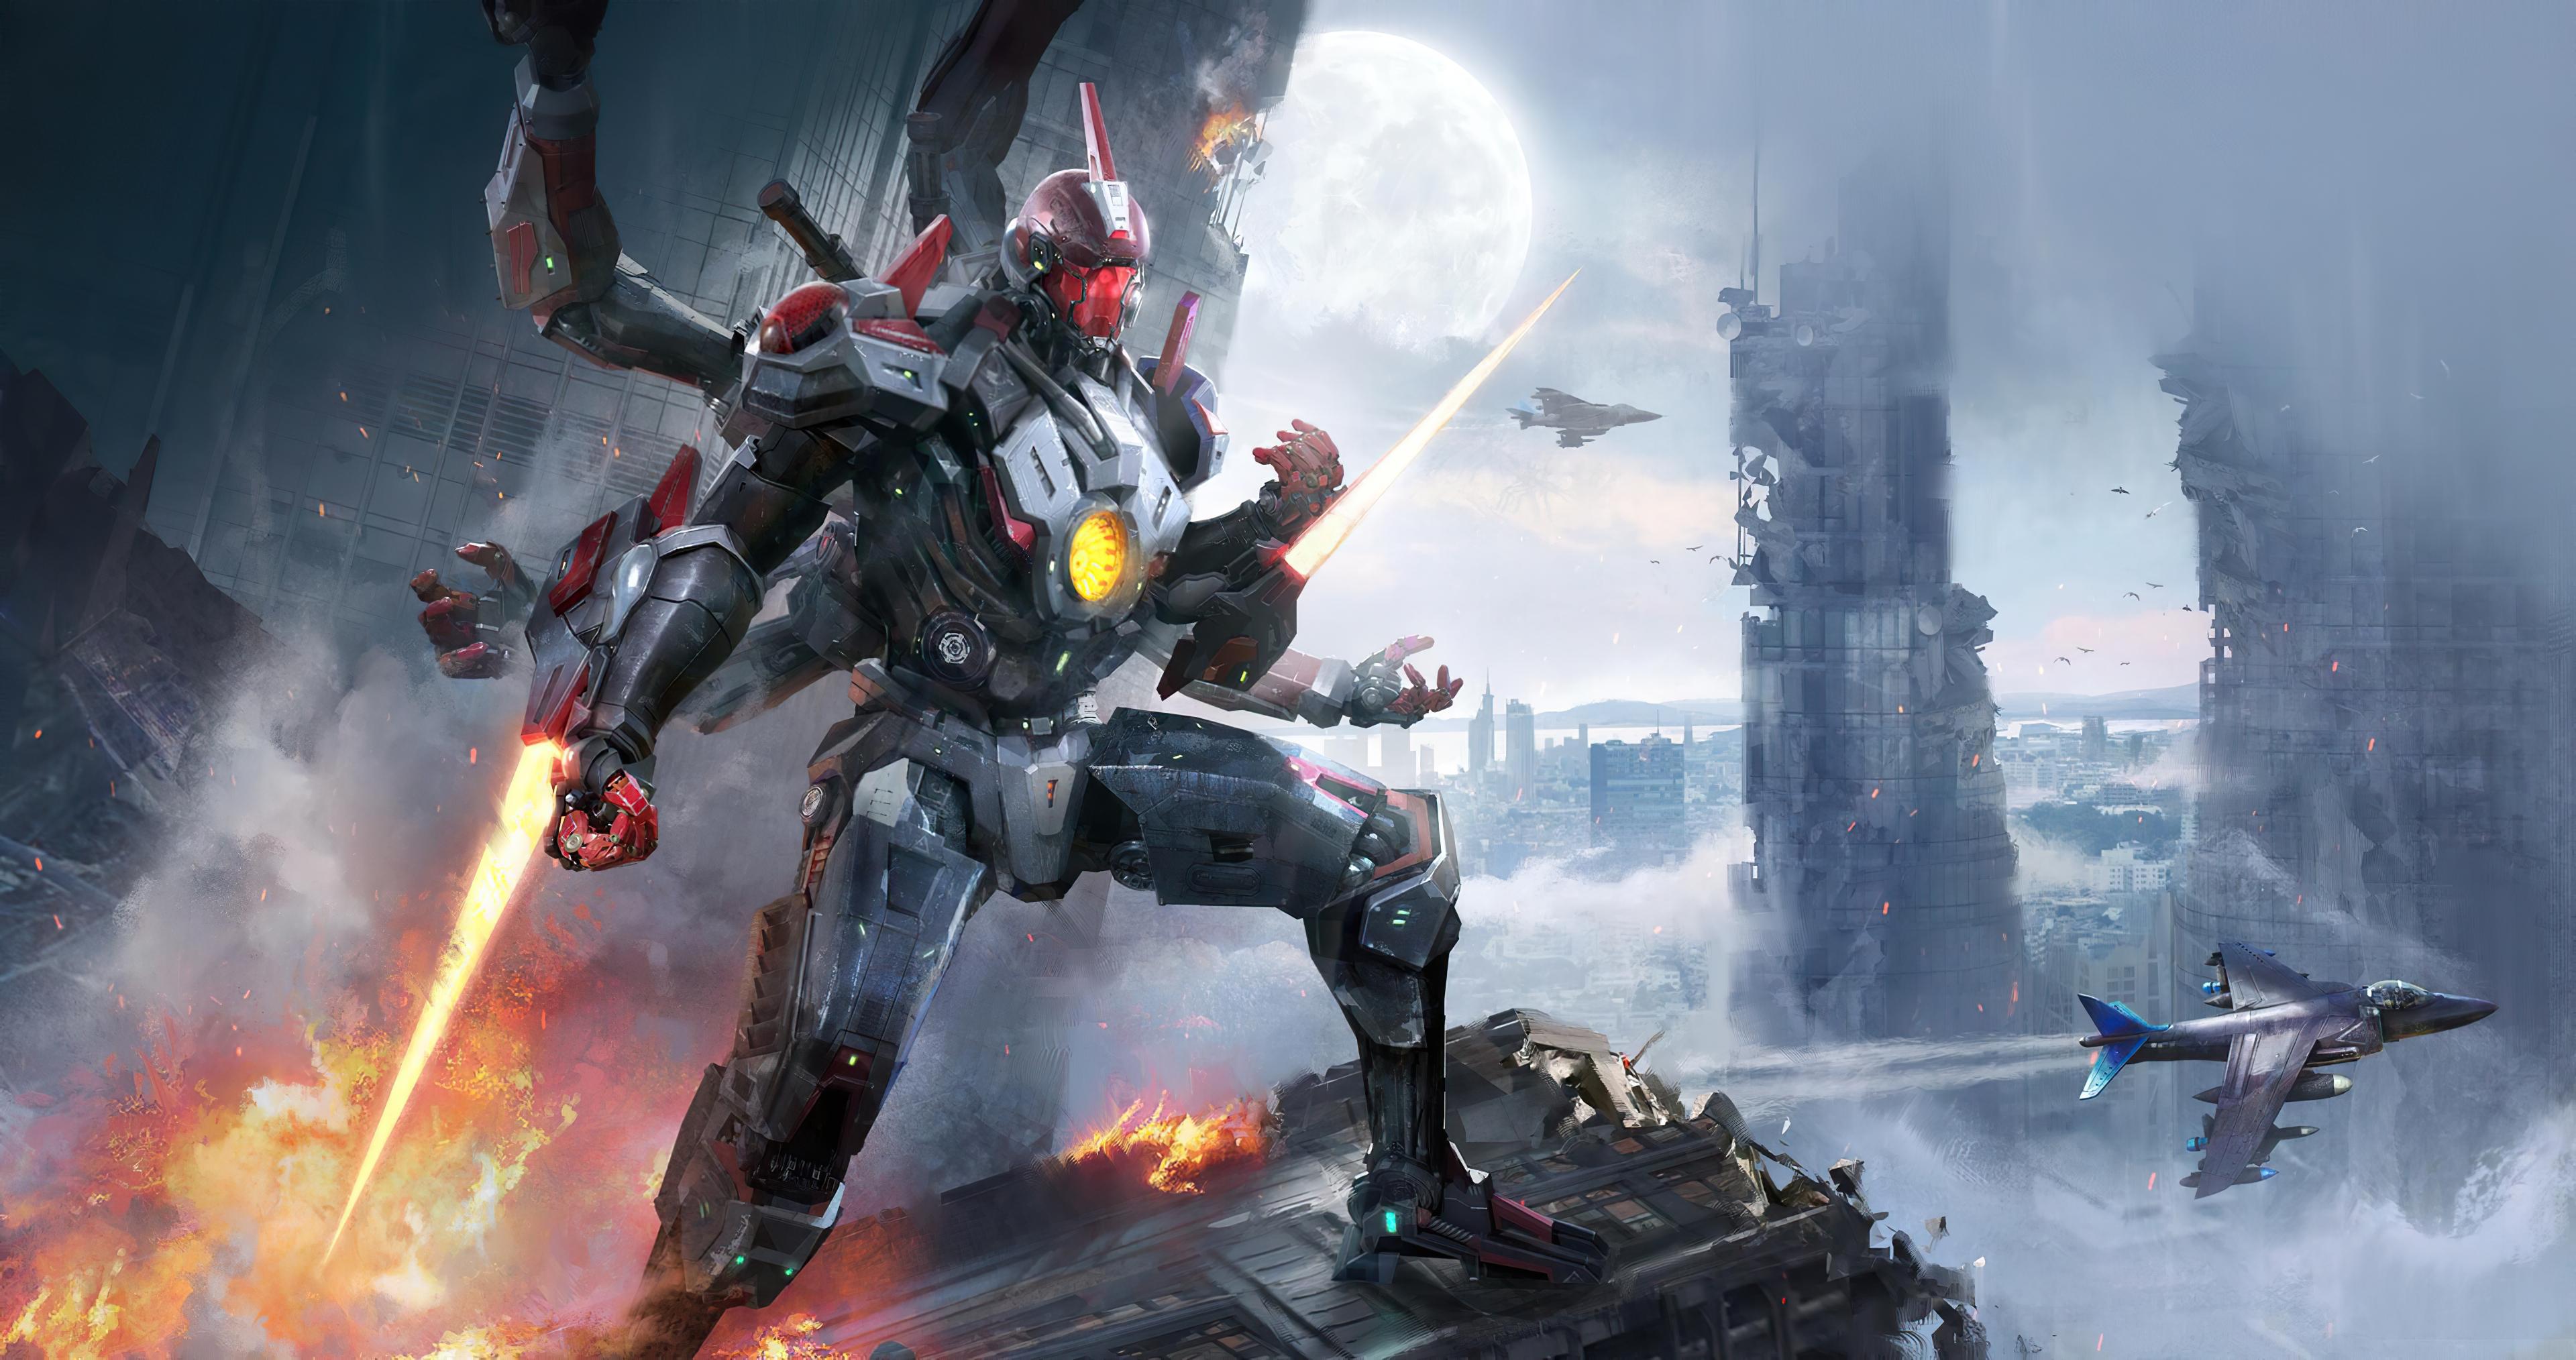 Futuristic Robot 3840x2028